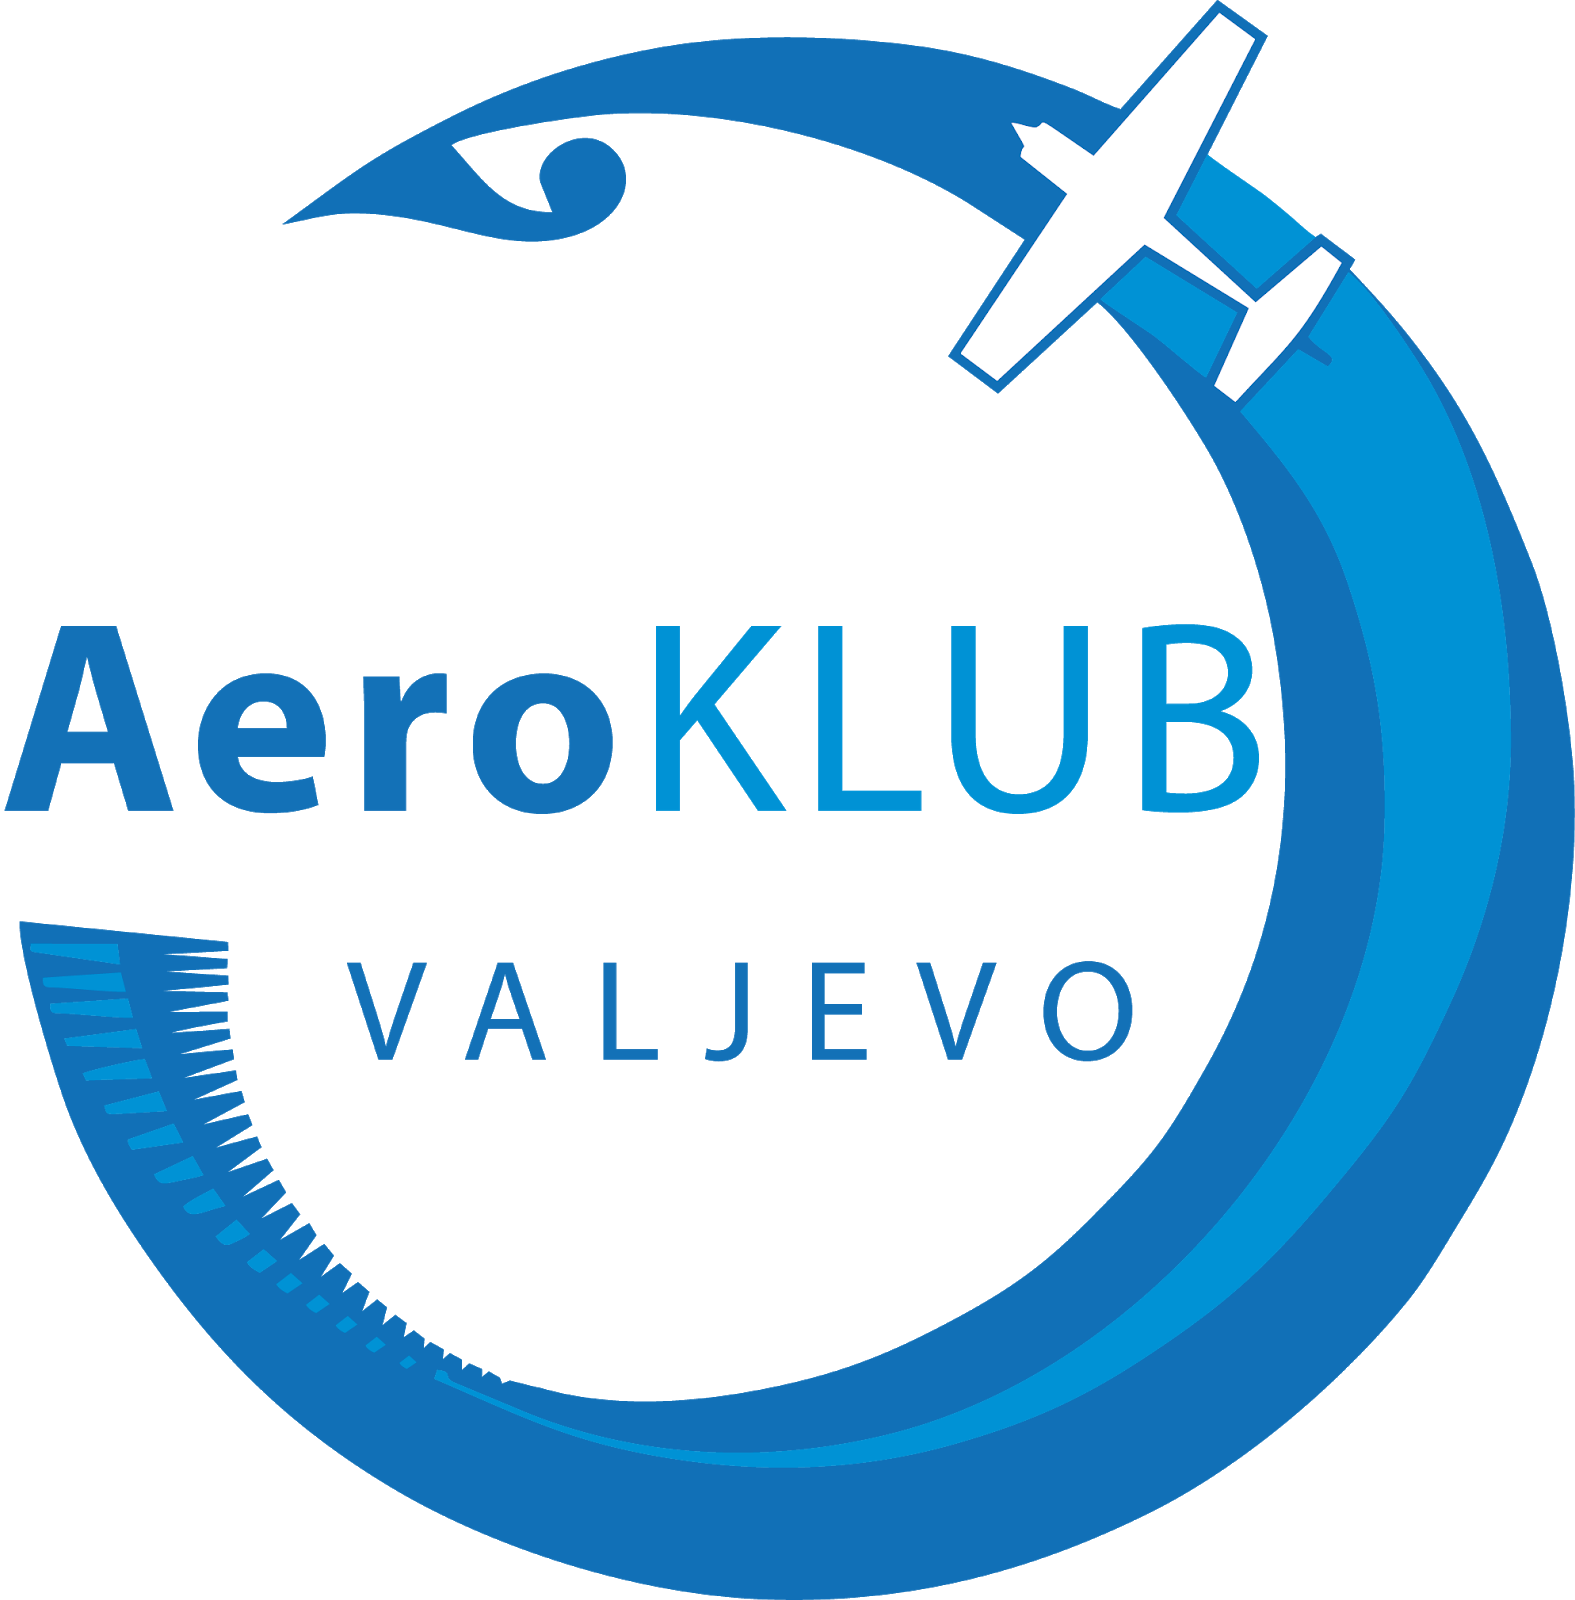 Aero Klub Valjevo